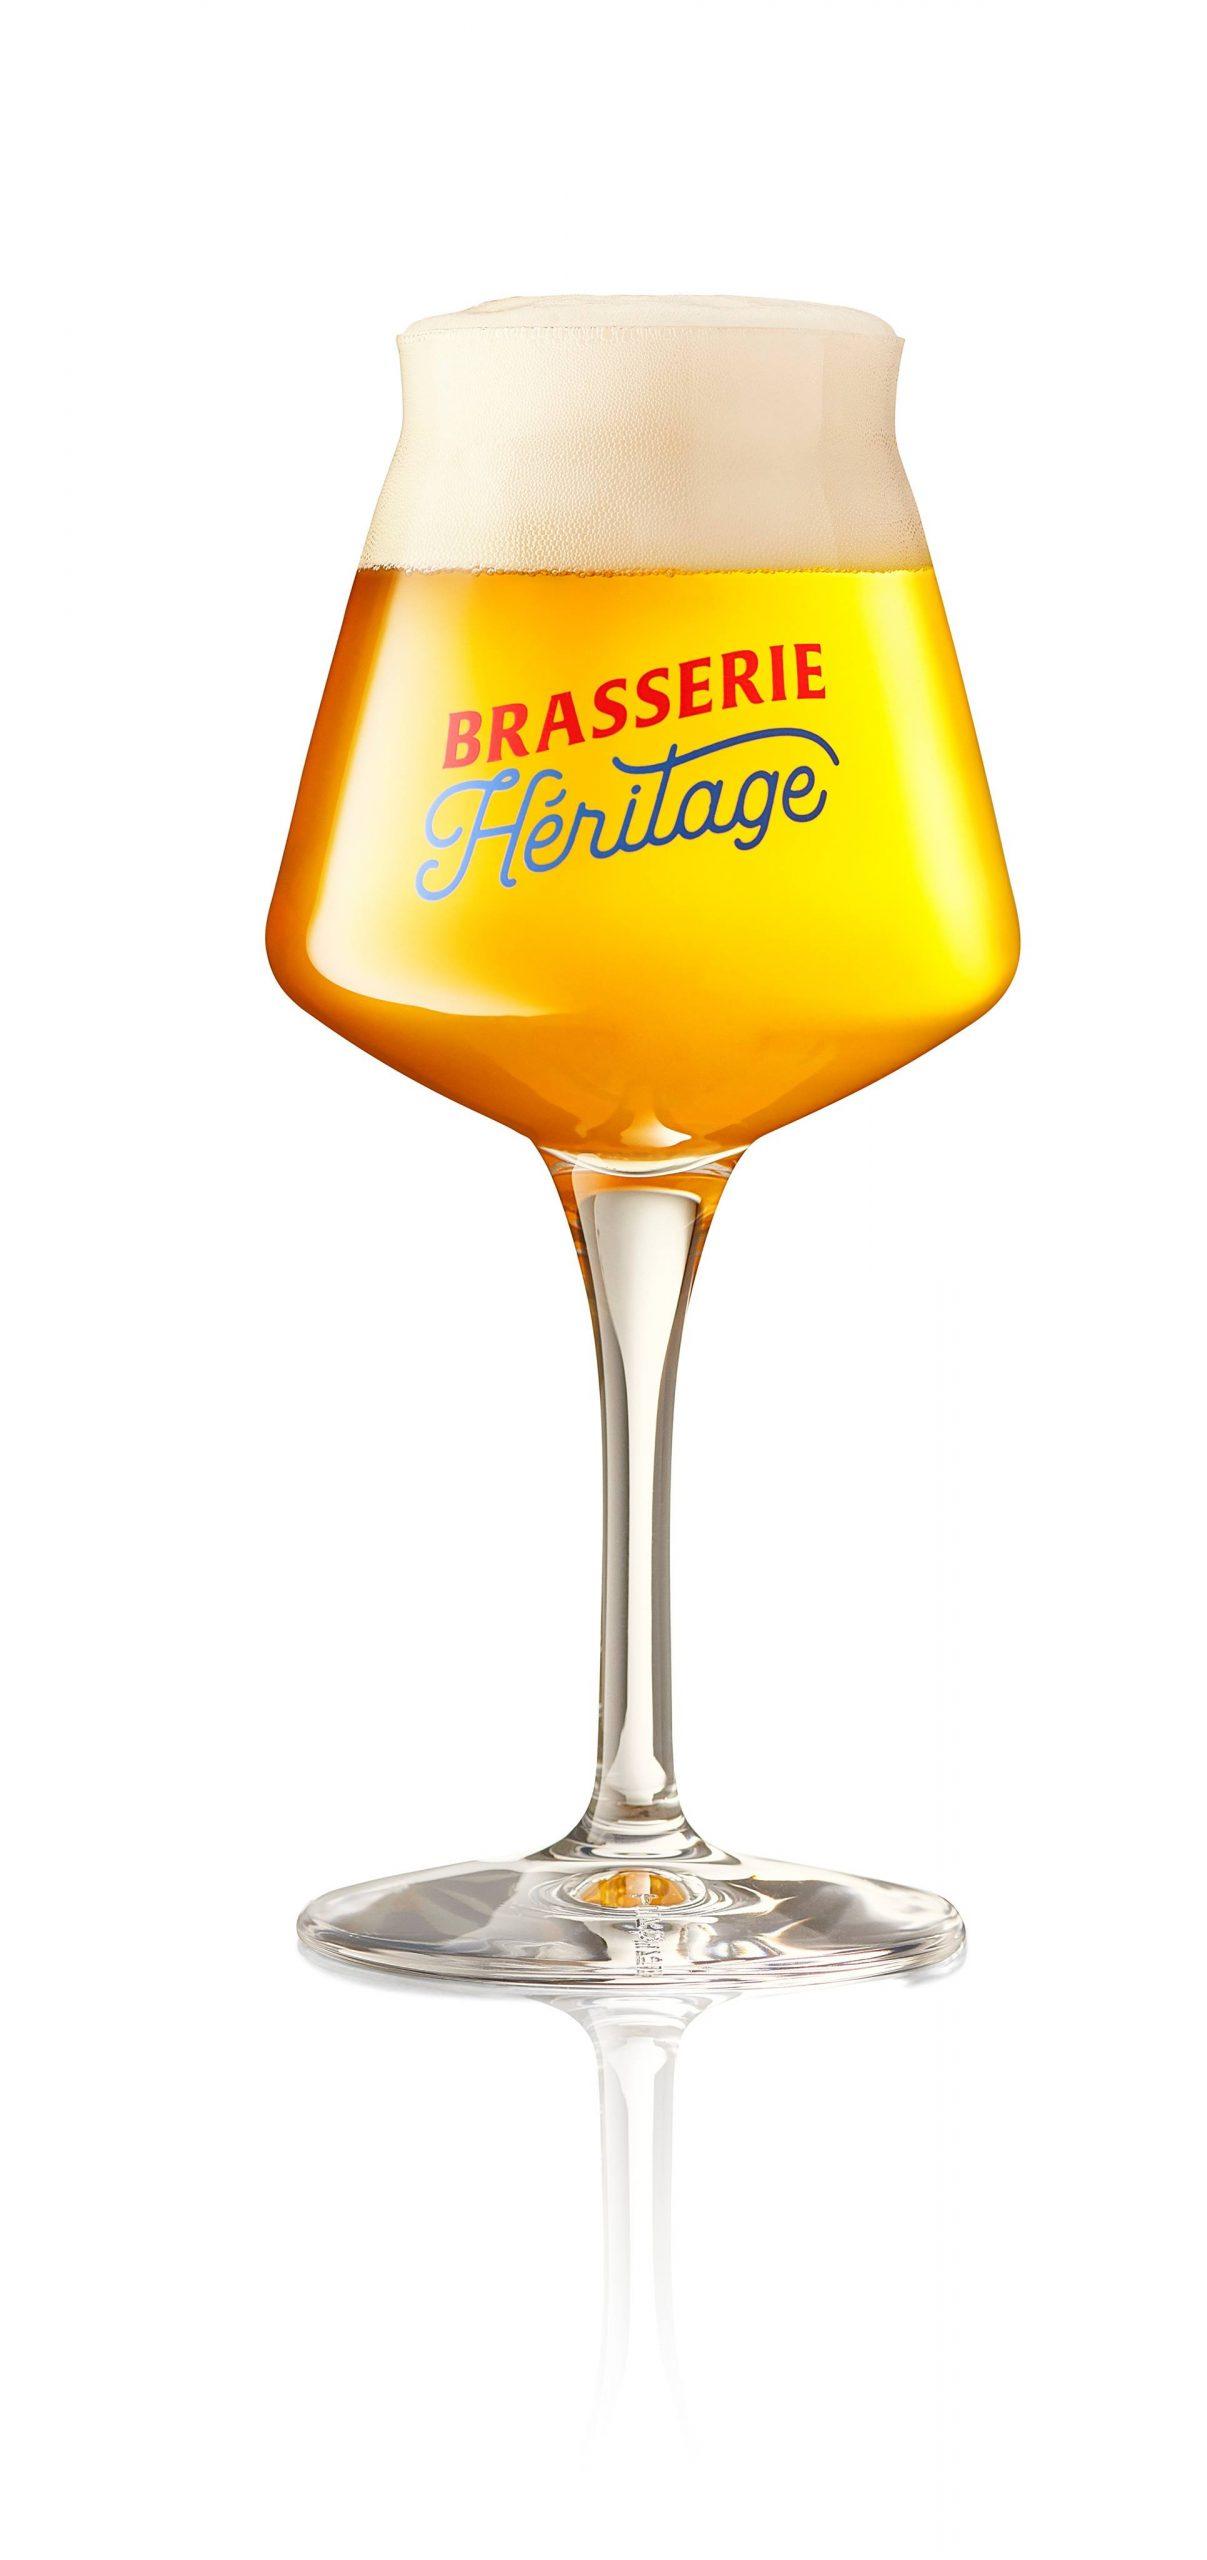 Brasserie Heritage - Verre 25